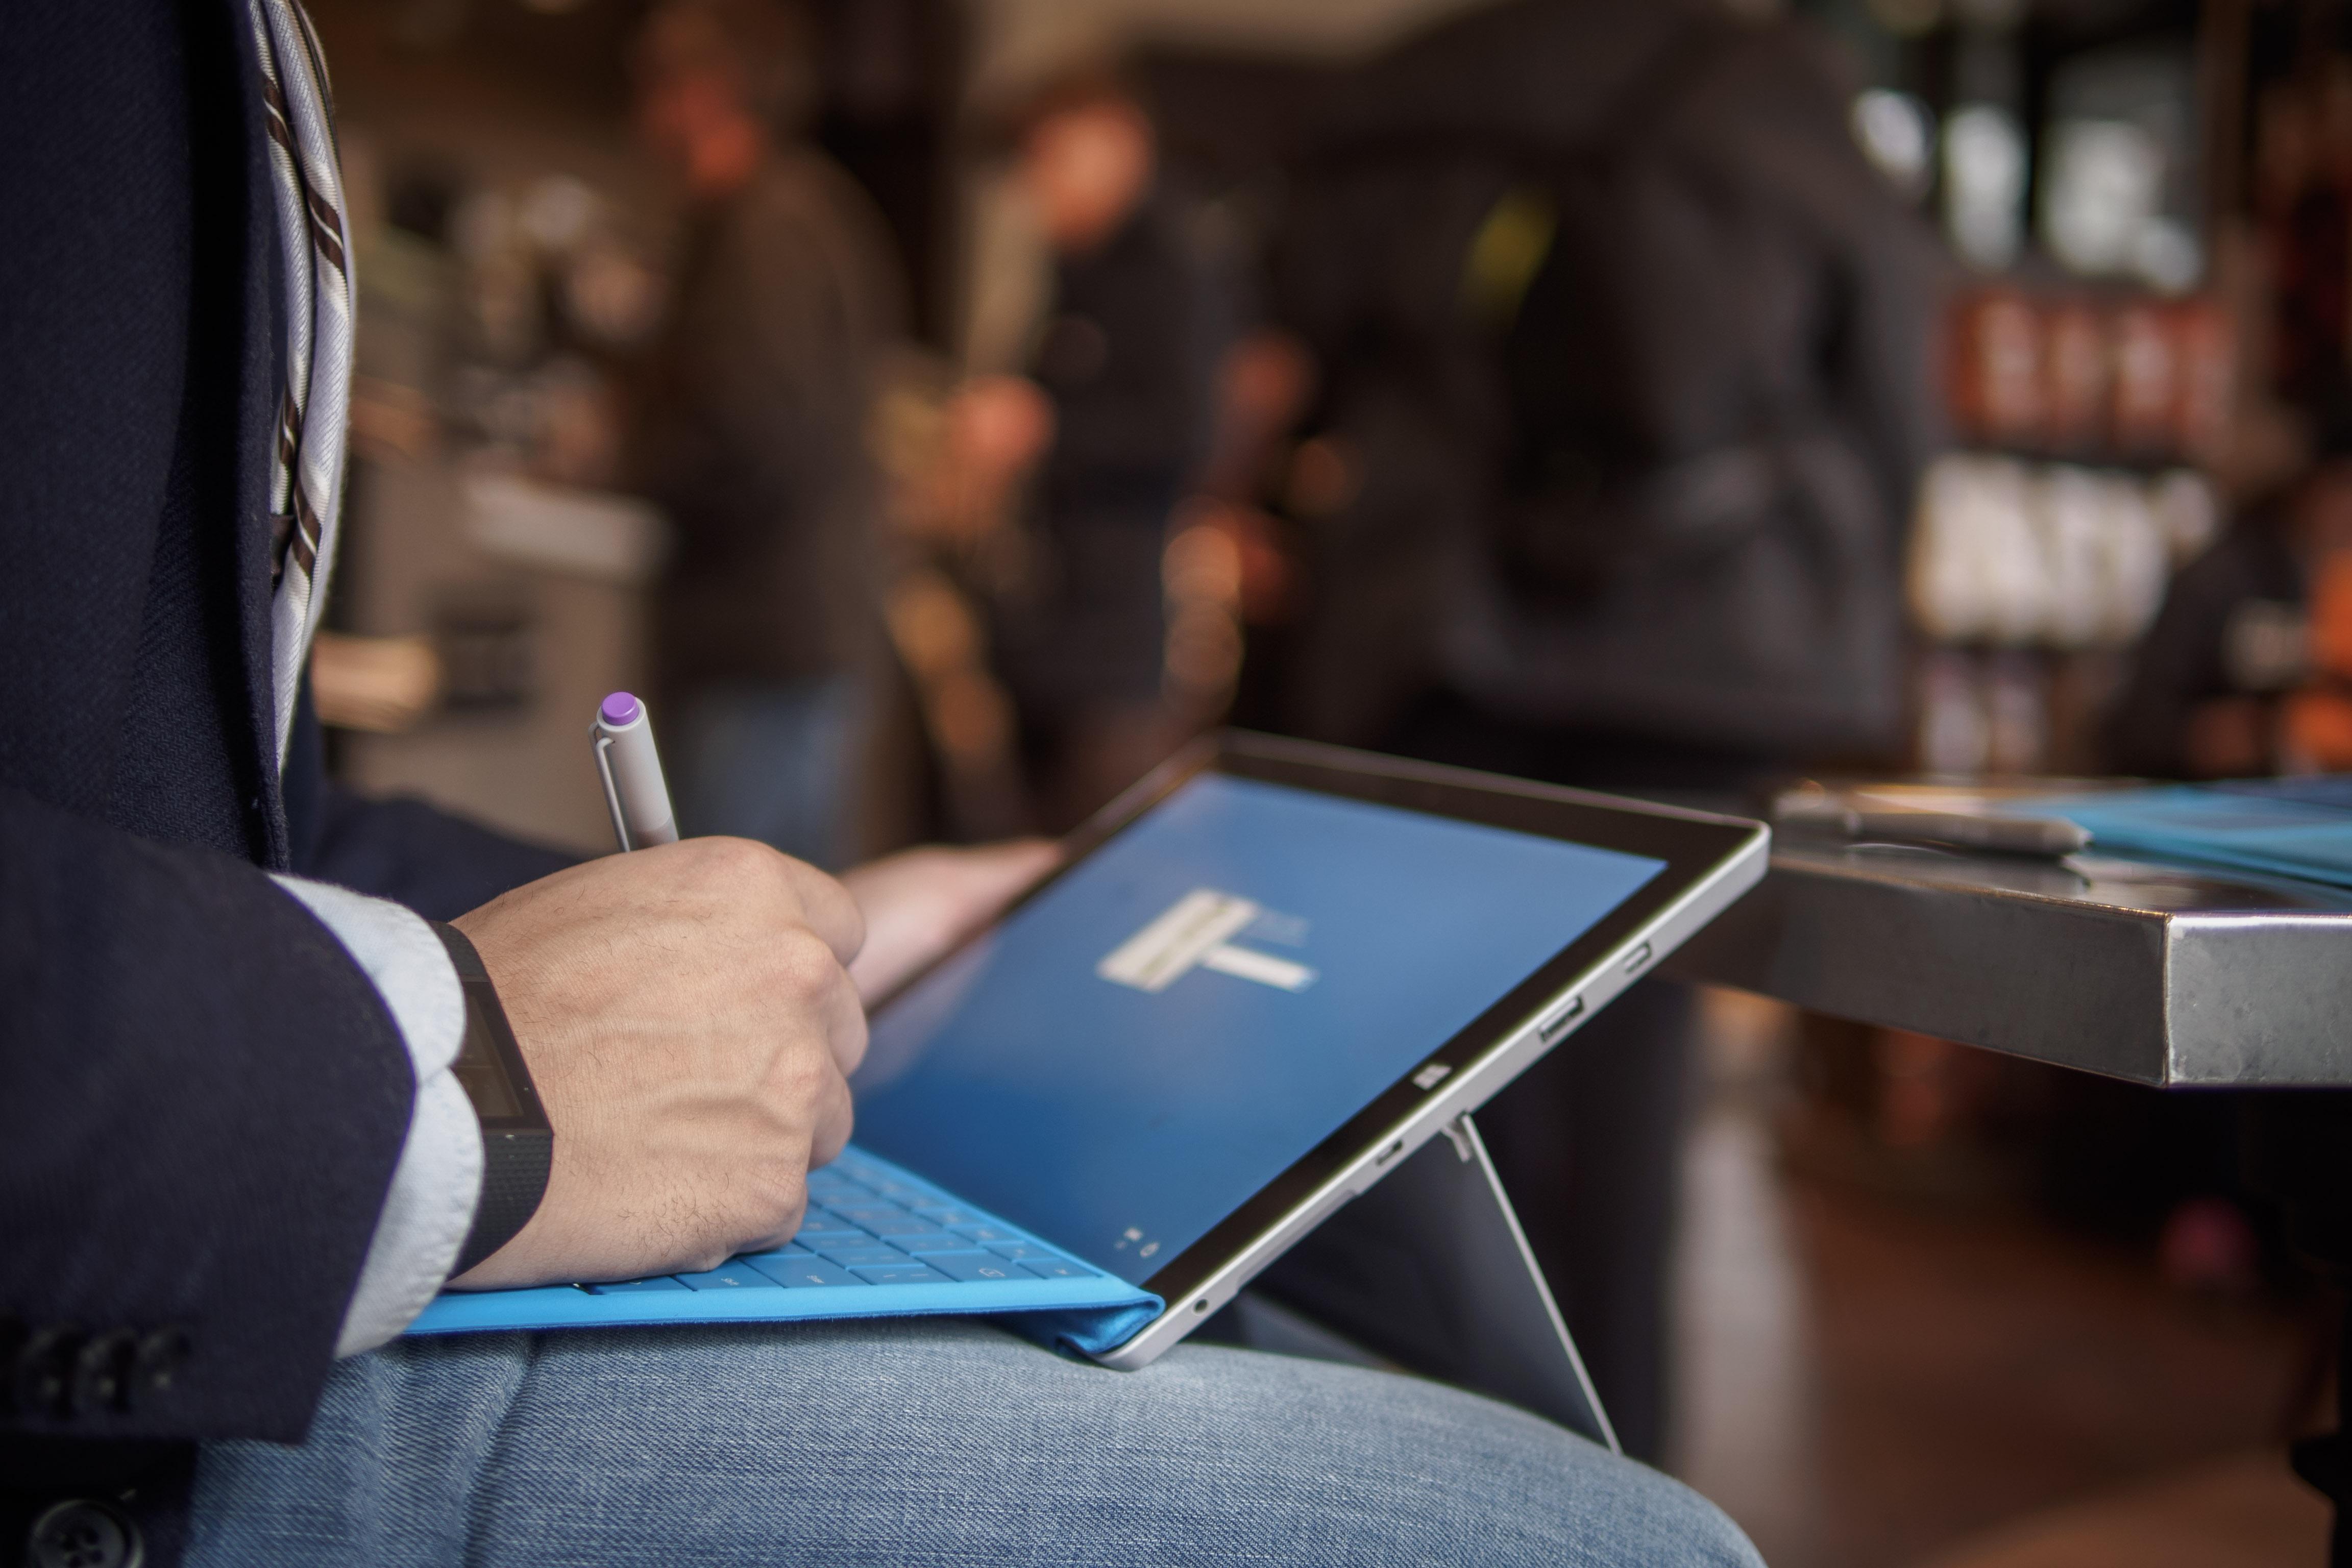 Windows 10 即將自動更新,無論用户願意與否?